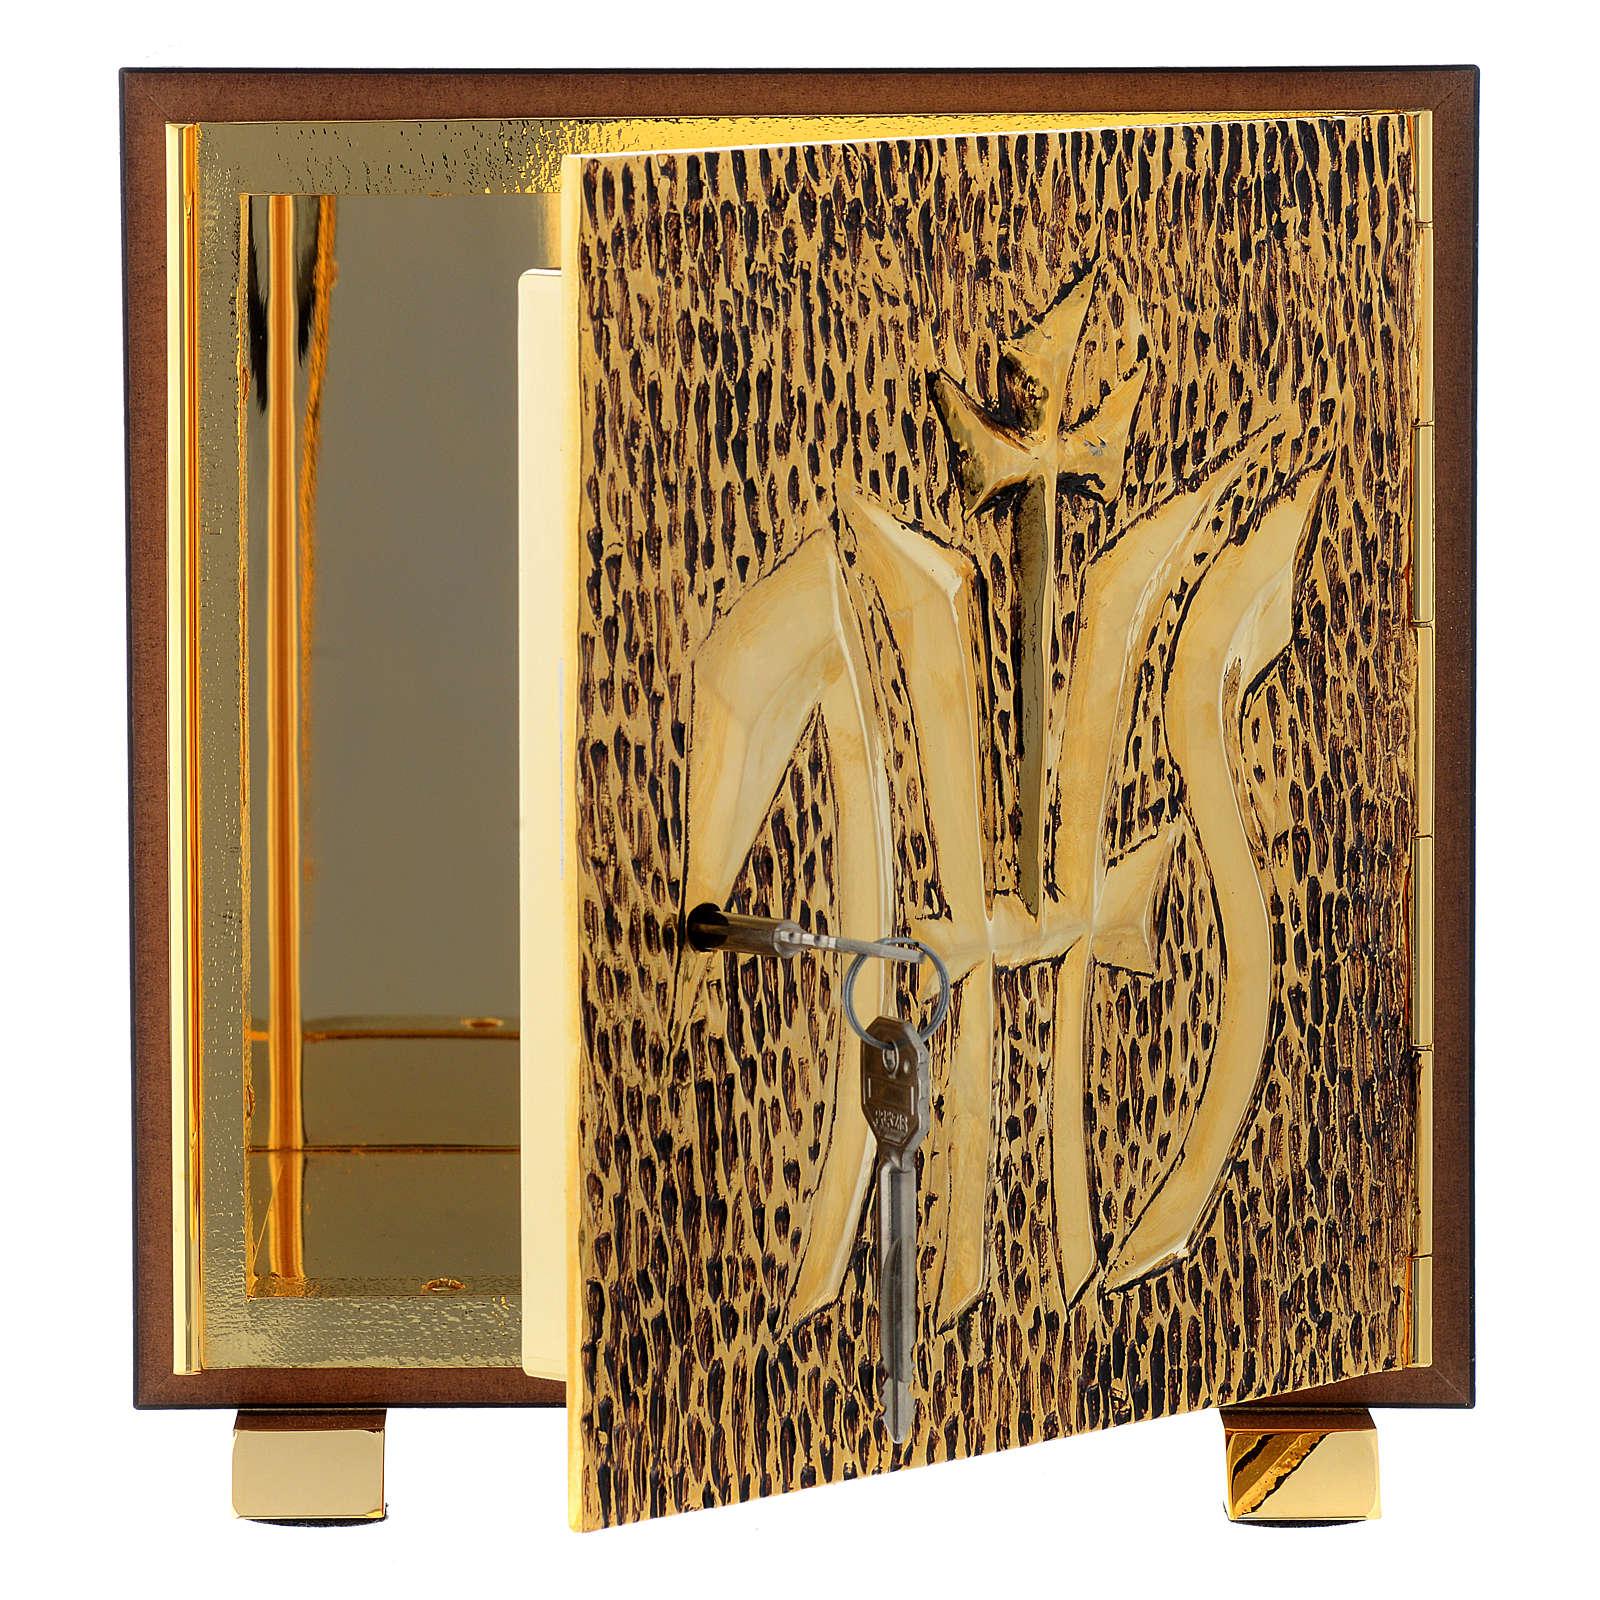 Tabernacle bois imitation marbre moulage laiton IHS 4